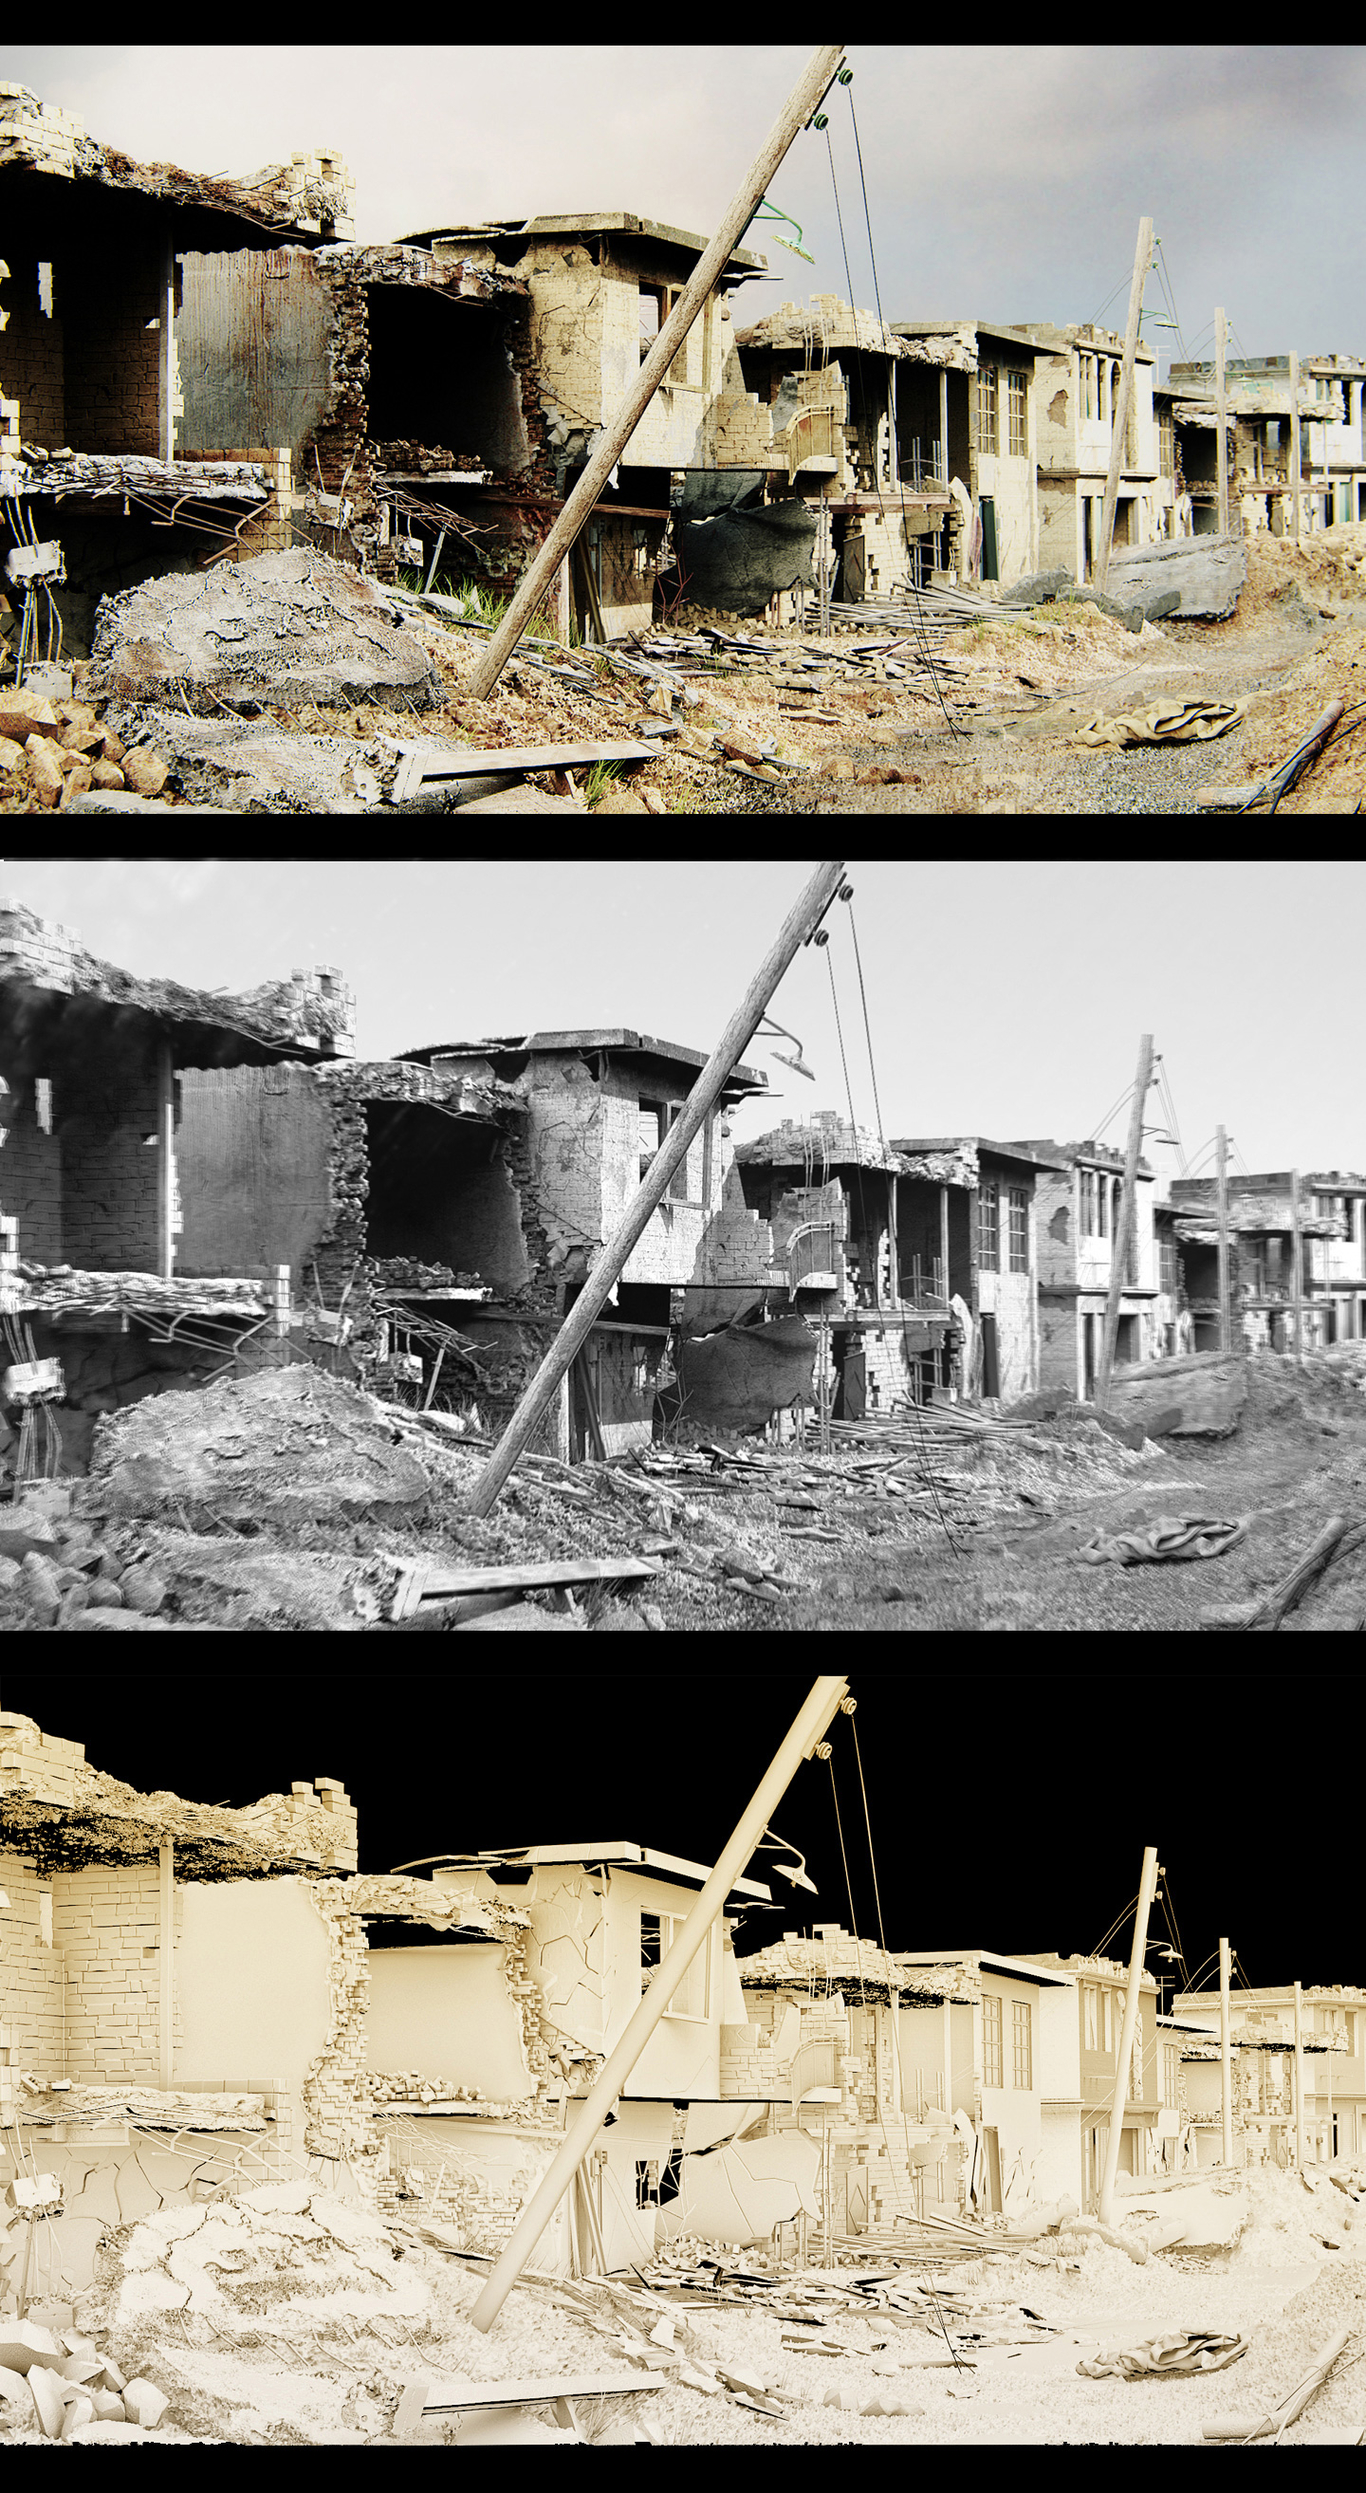 Alireza akhbari ruined city 1 9a3b5823 vmoh